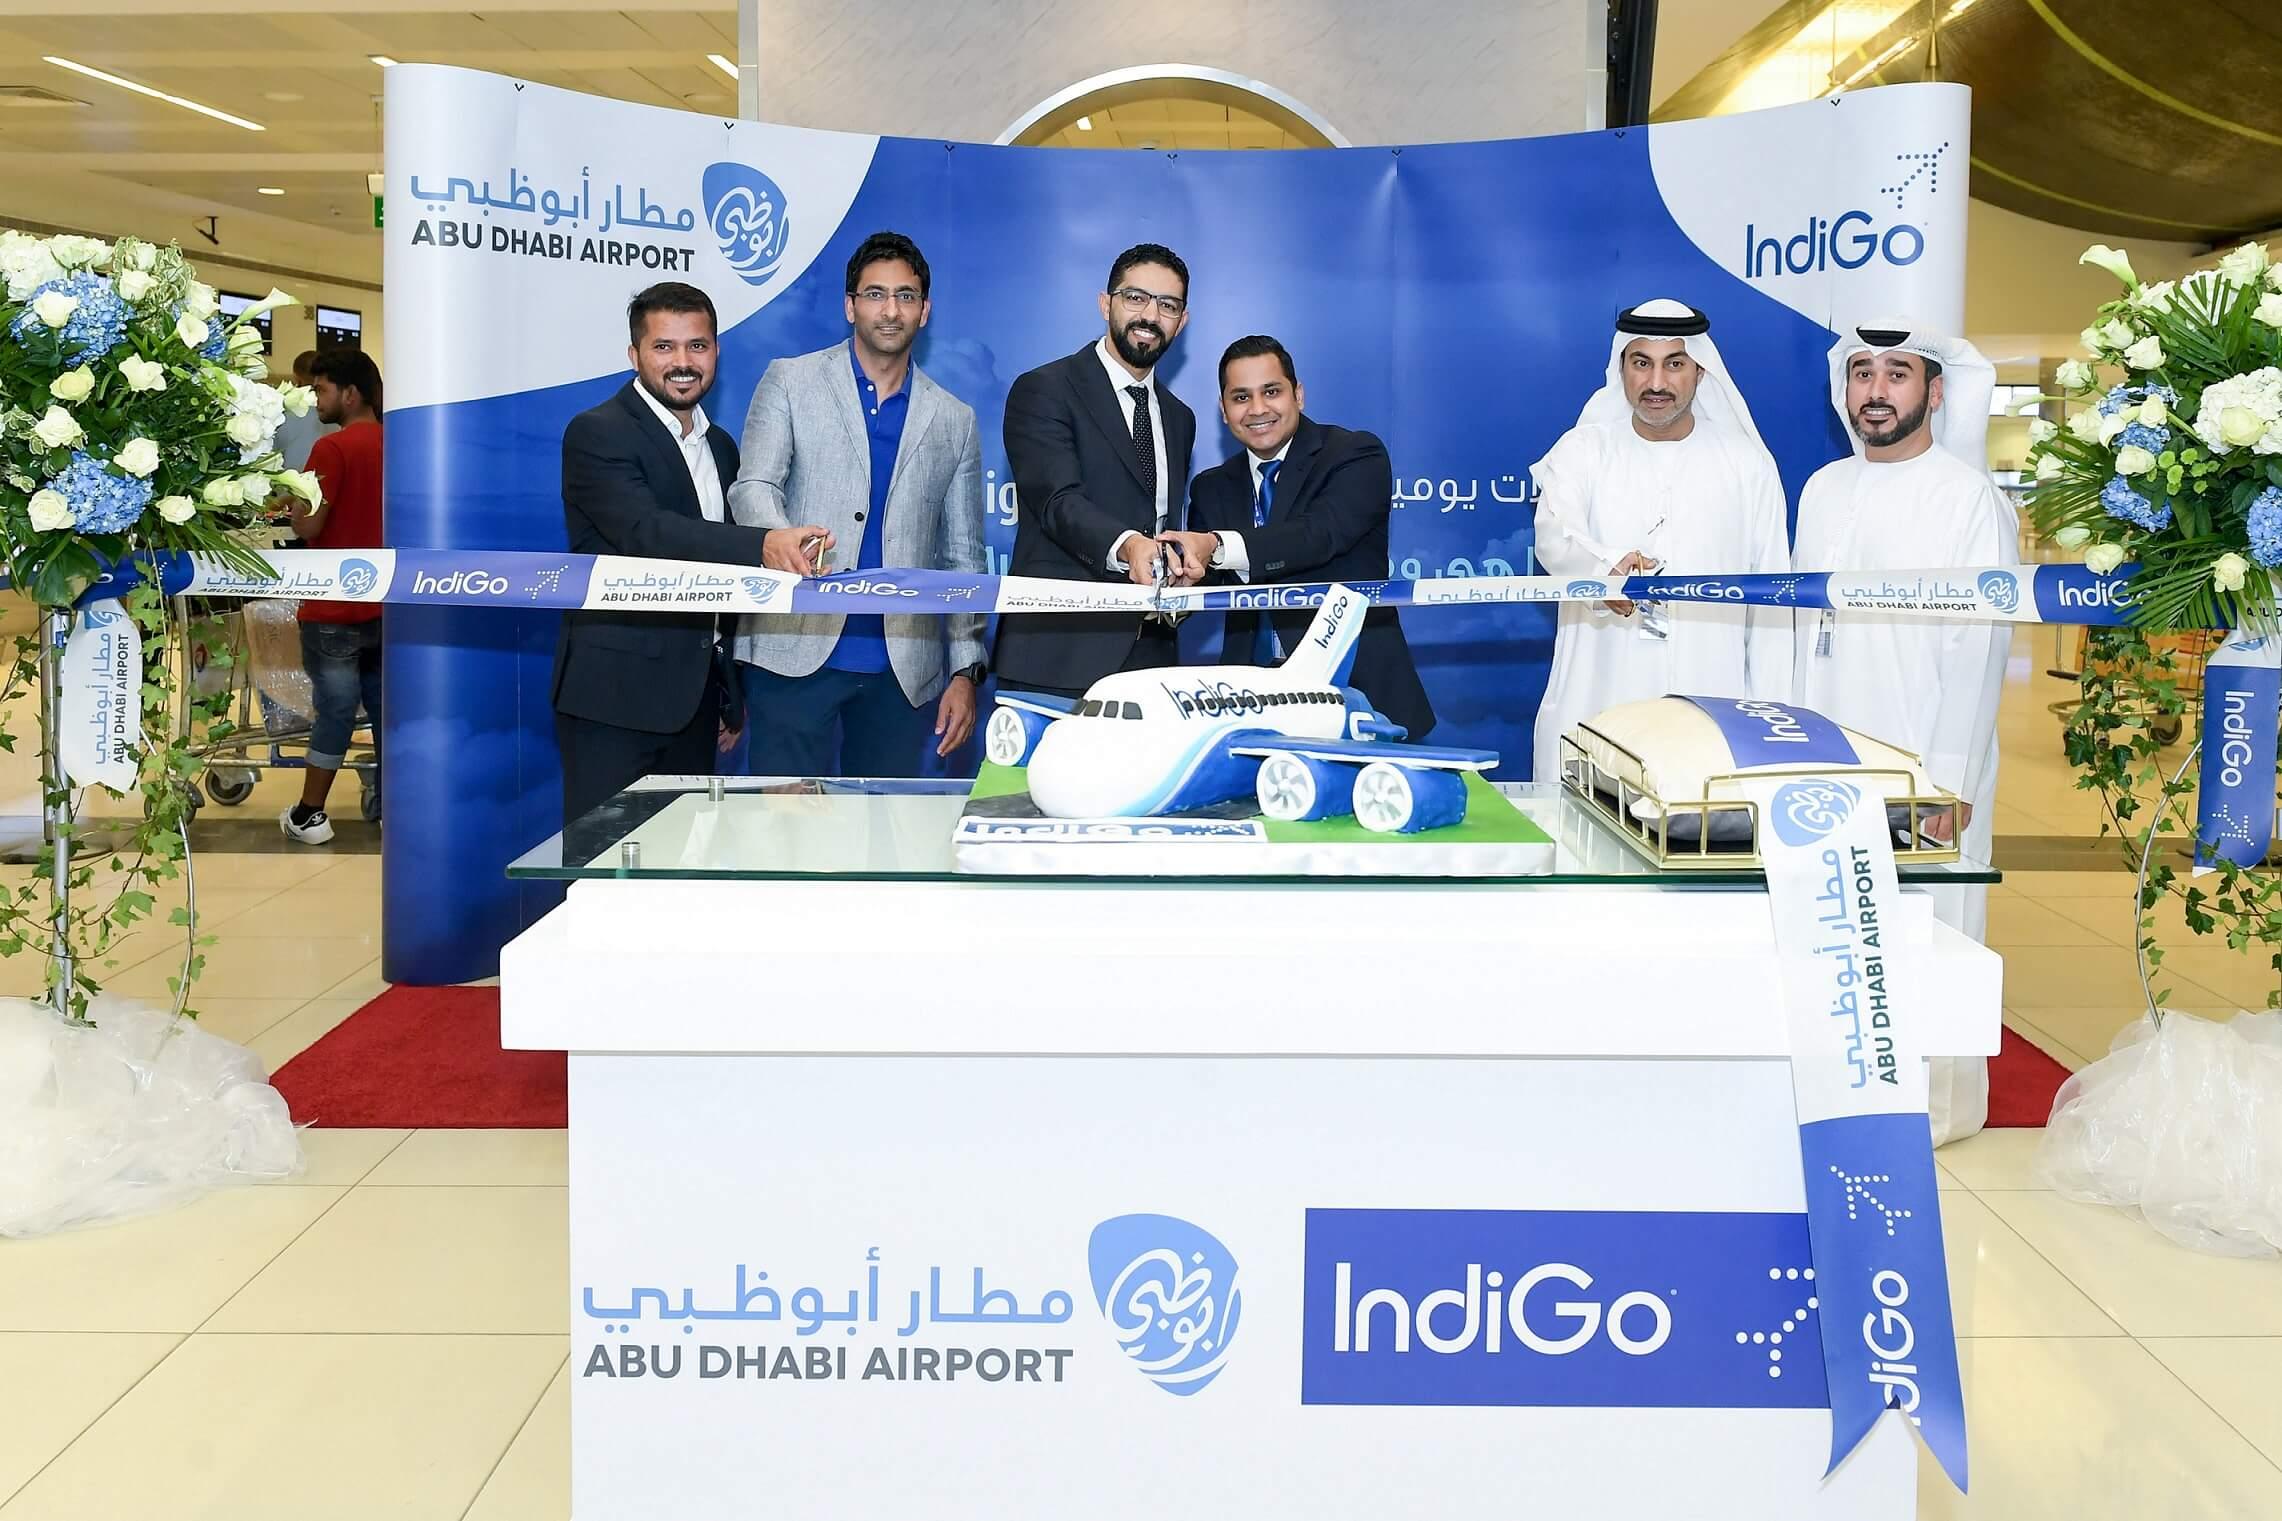 , IndiGo commences operations on two new routes between India and Abu Dhabi, Buzz travel | eTurboNews |Travel News